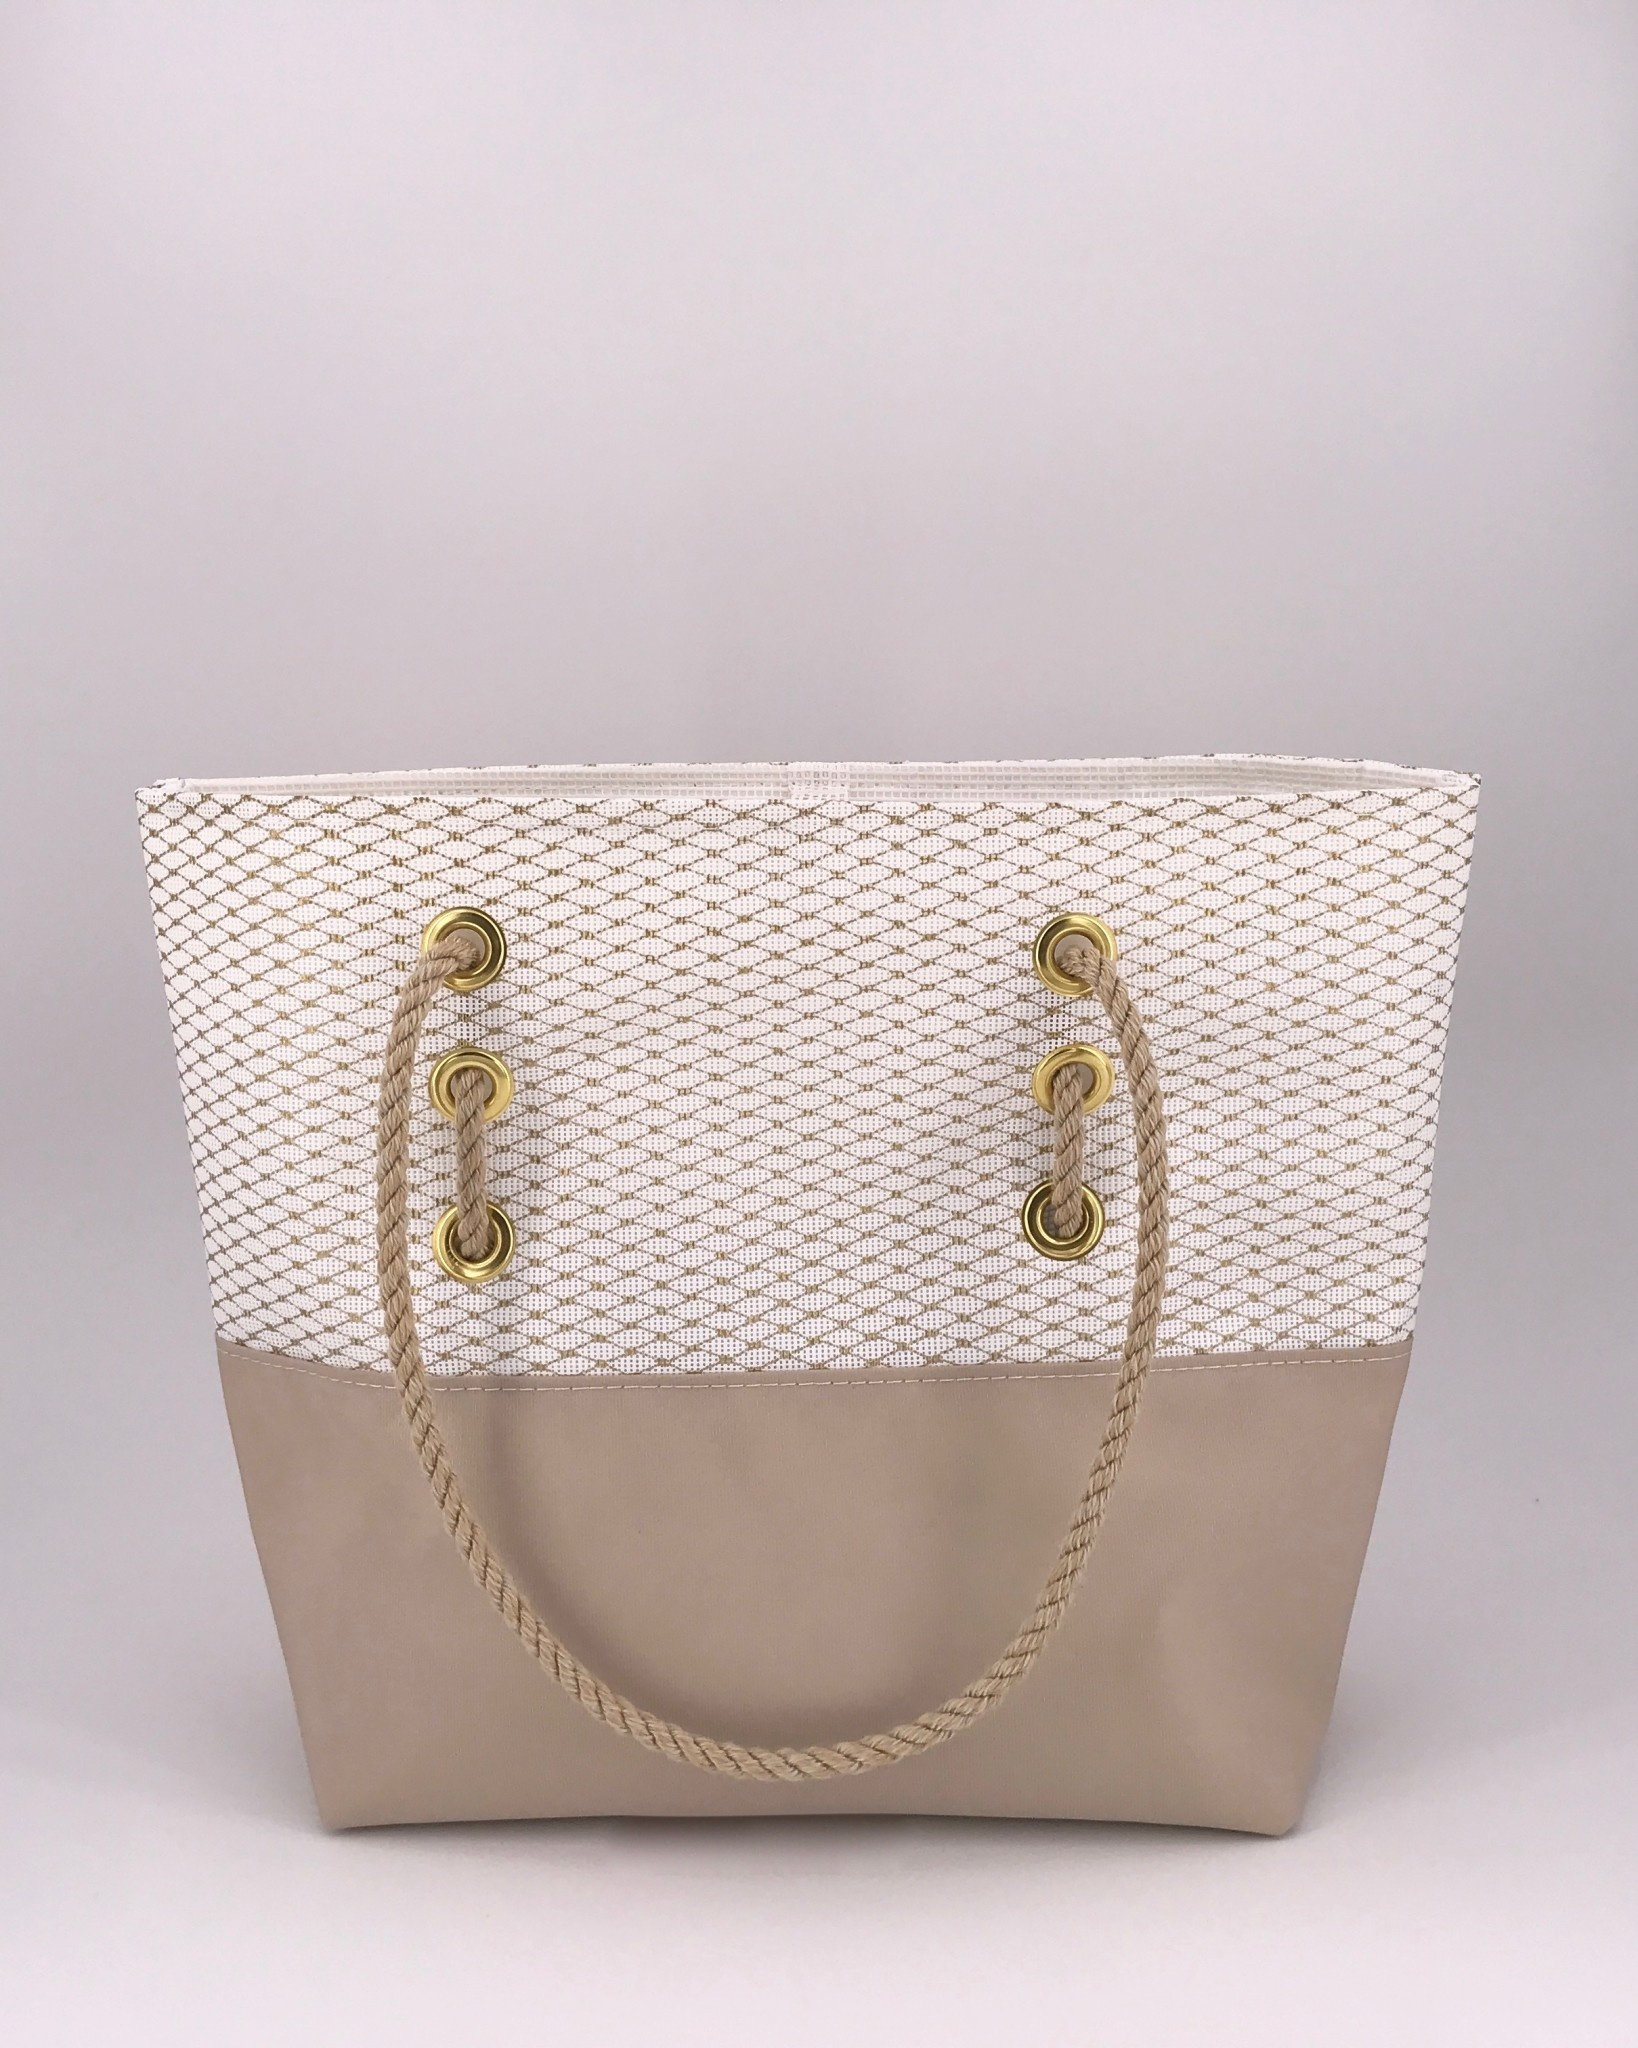 Alaina Marie ® Mini Gold Metallic & Khaki Tote